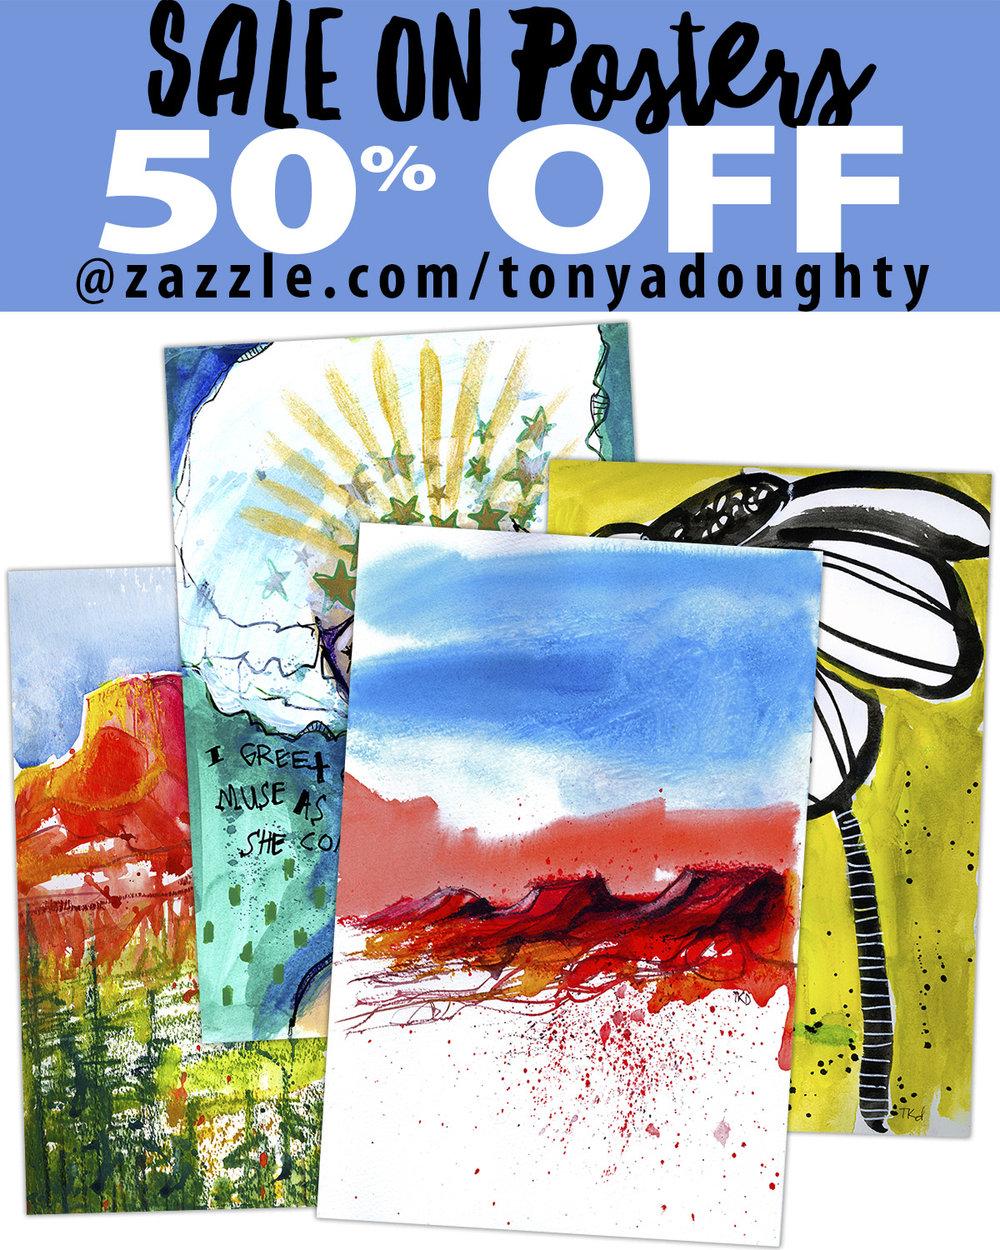 Zazzle Posters 50.jpg